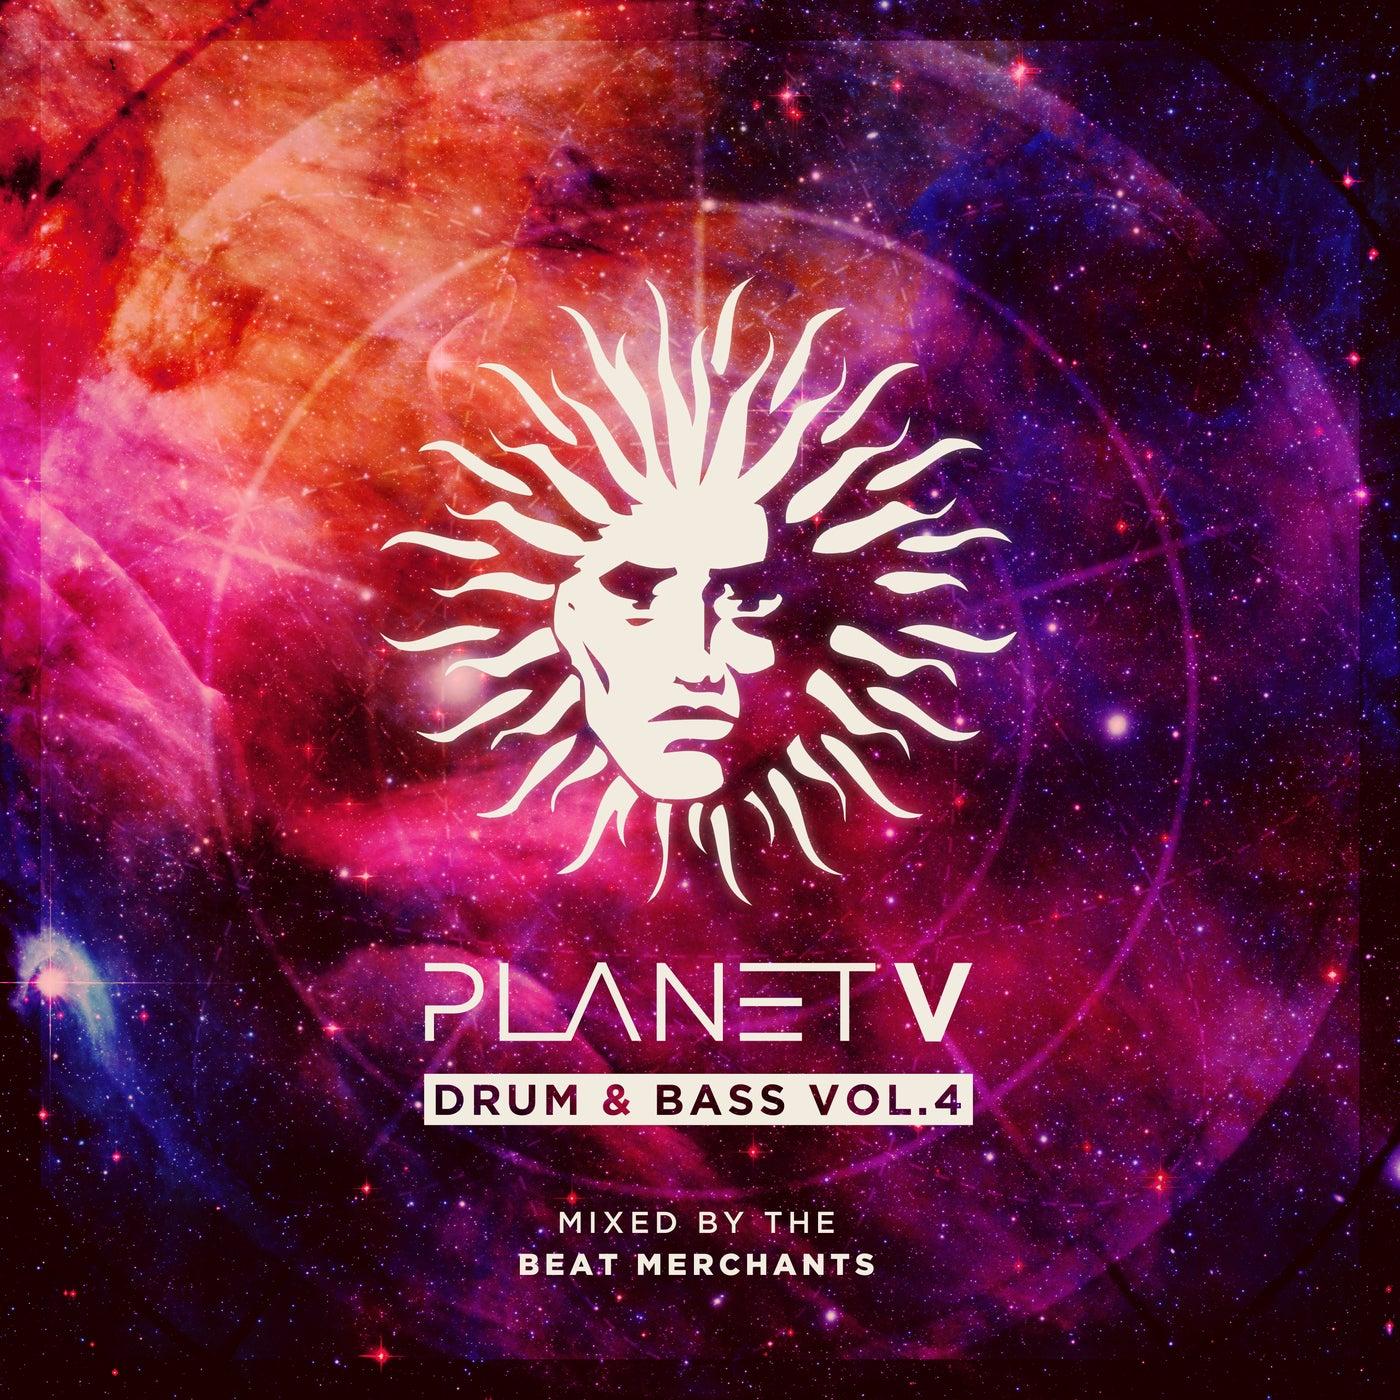 Planet V - Drum & Bass Vol. 4